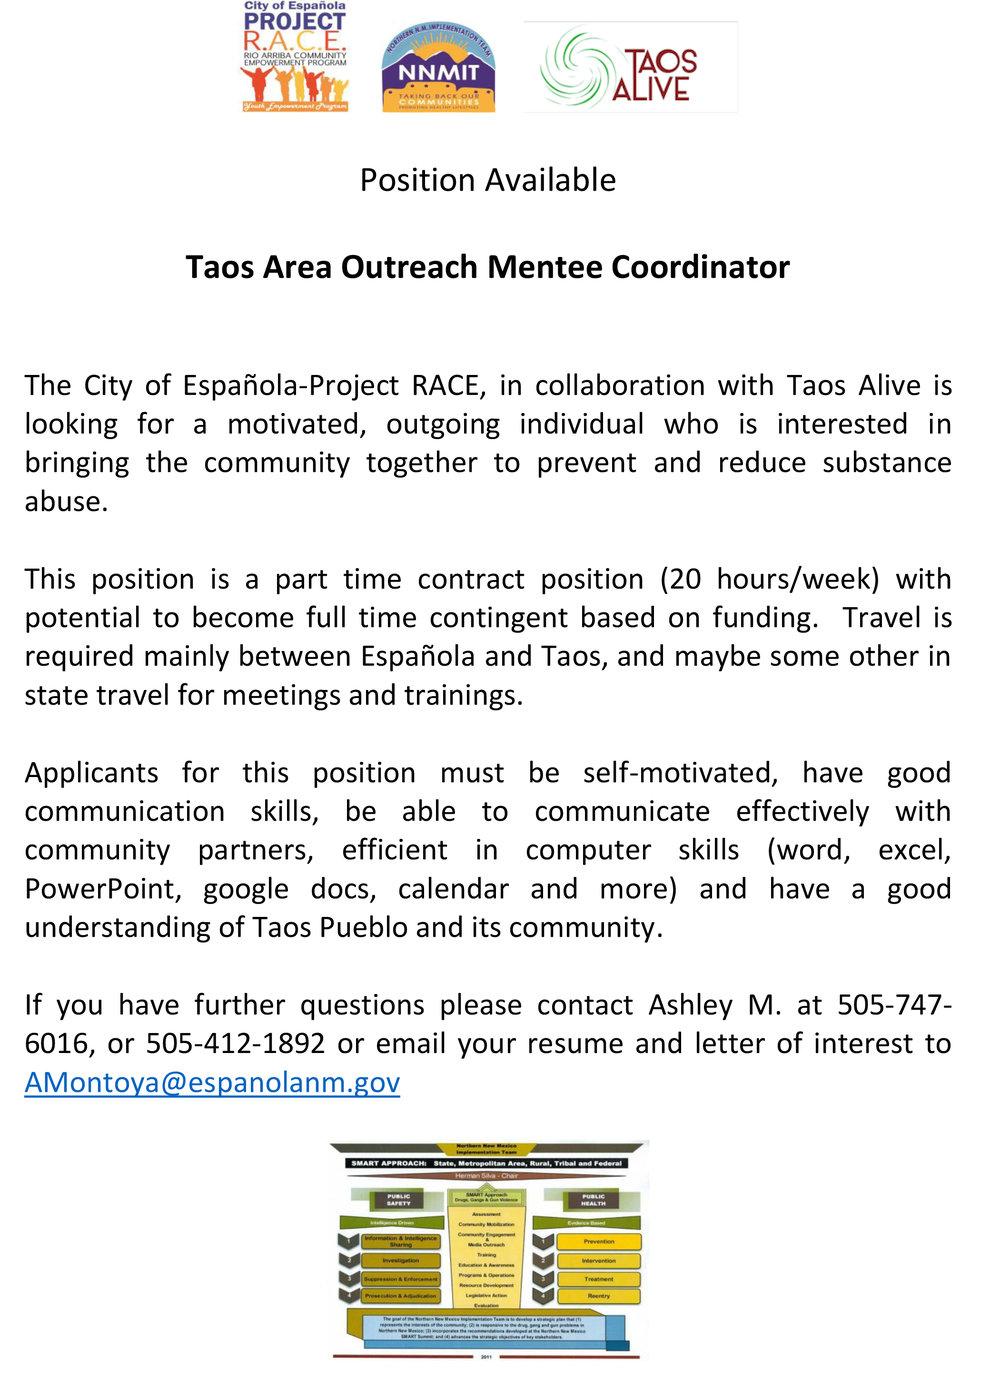 Taos Area Outreach Mentee Coordinator.jpg